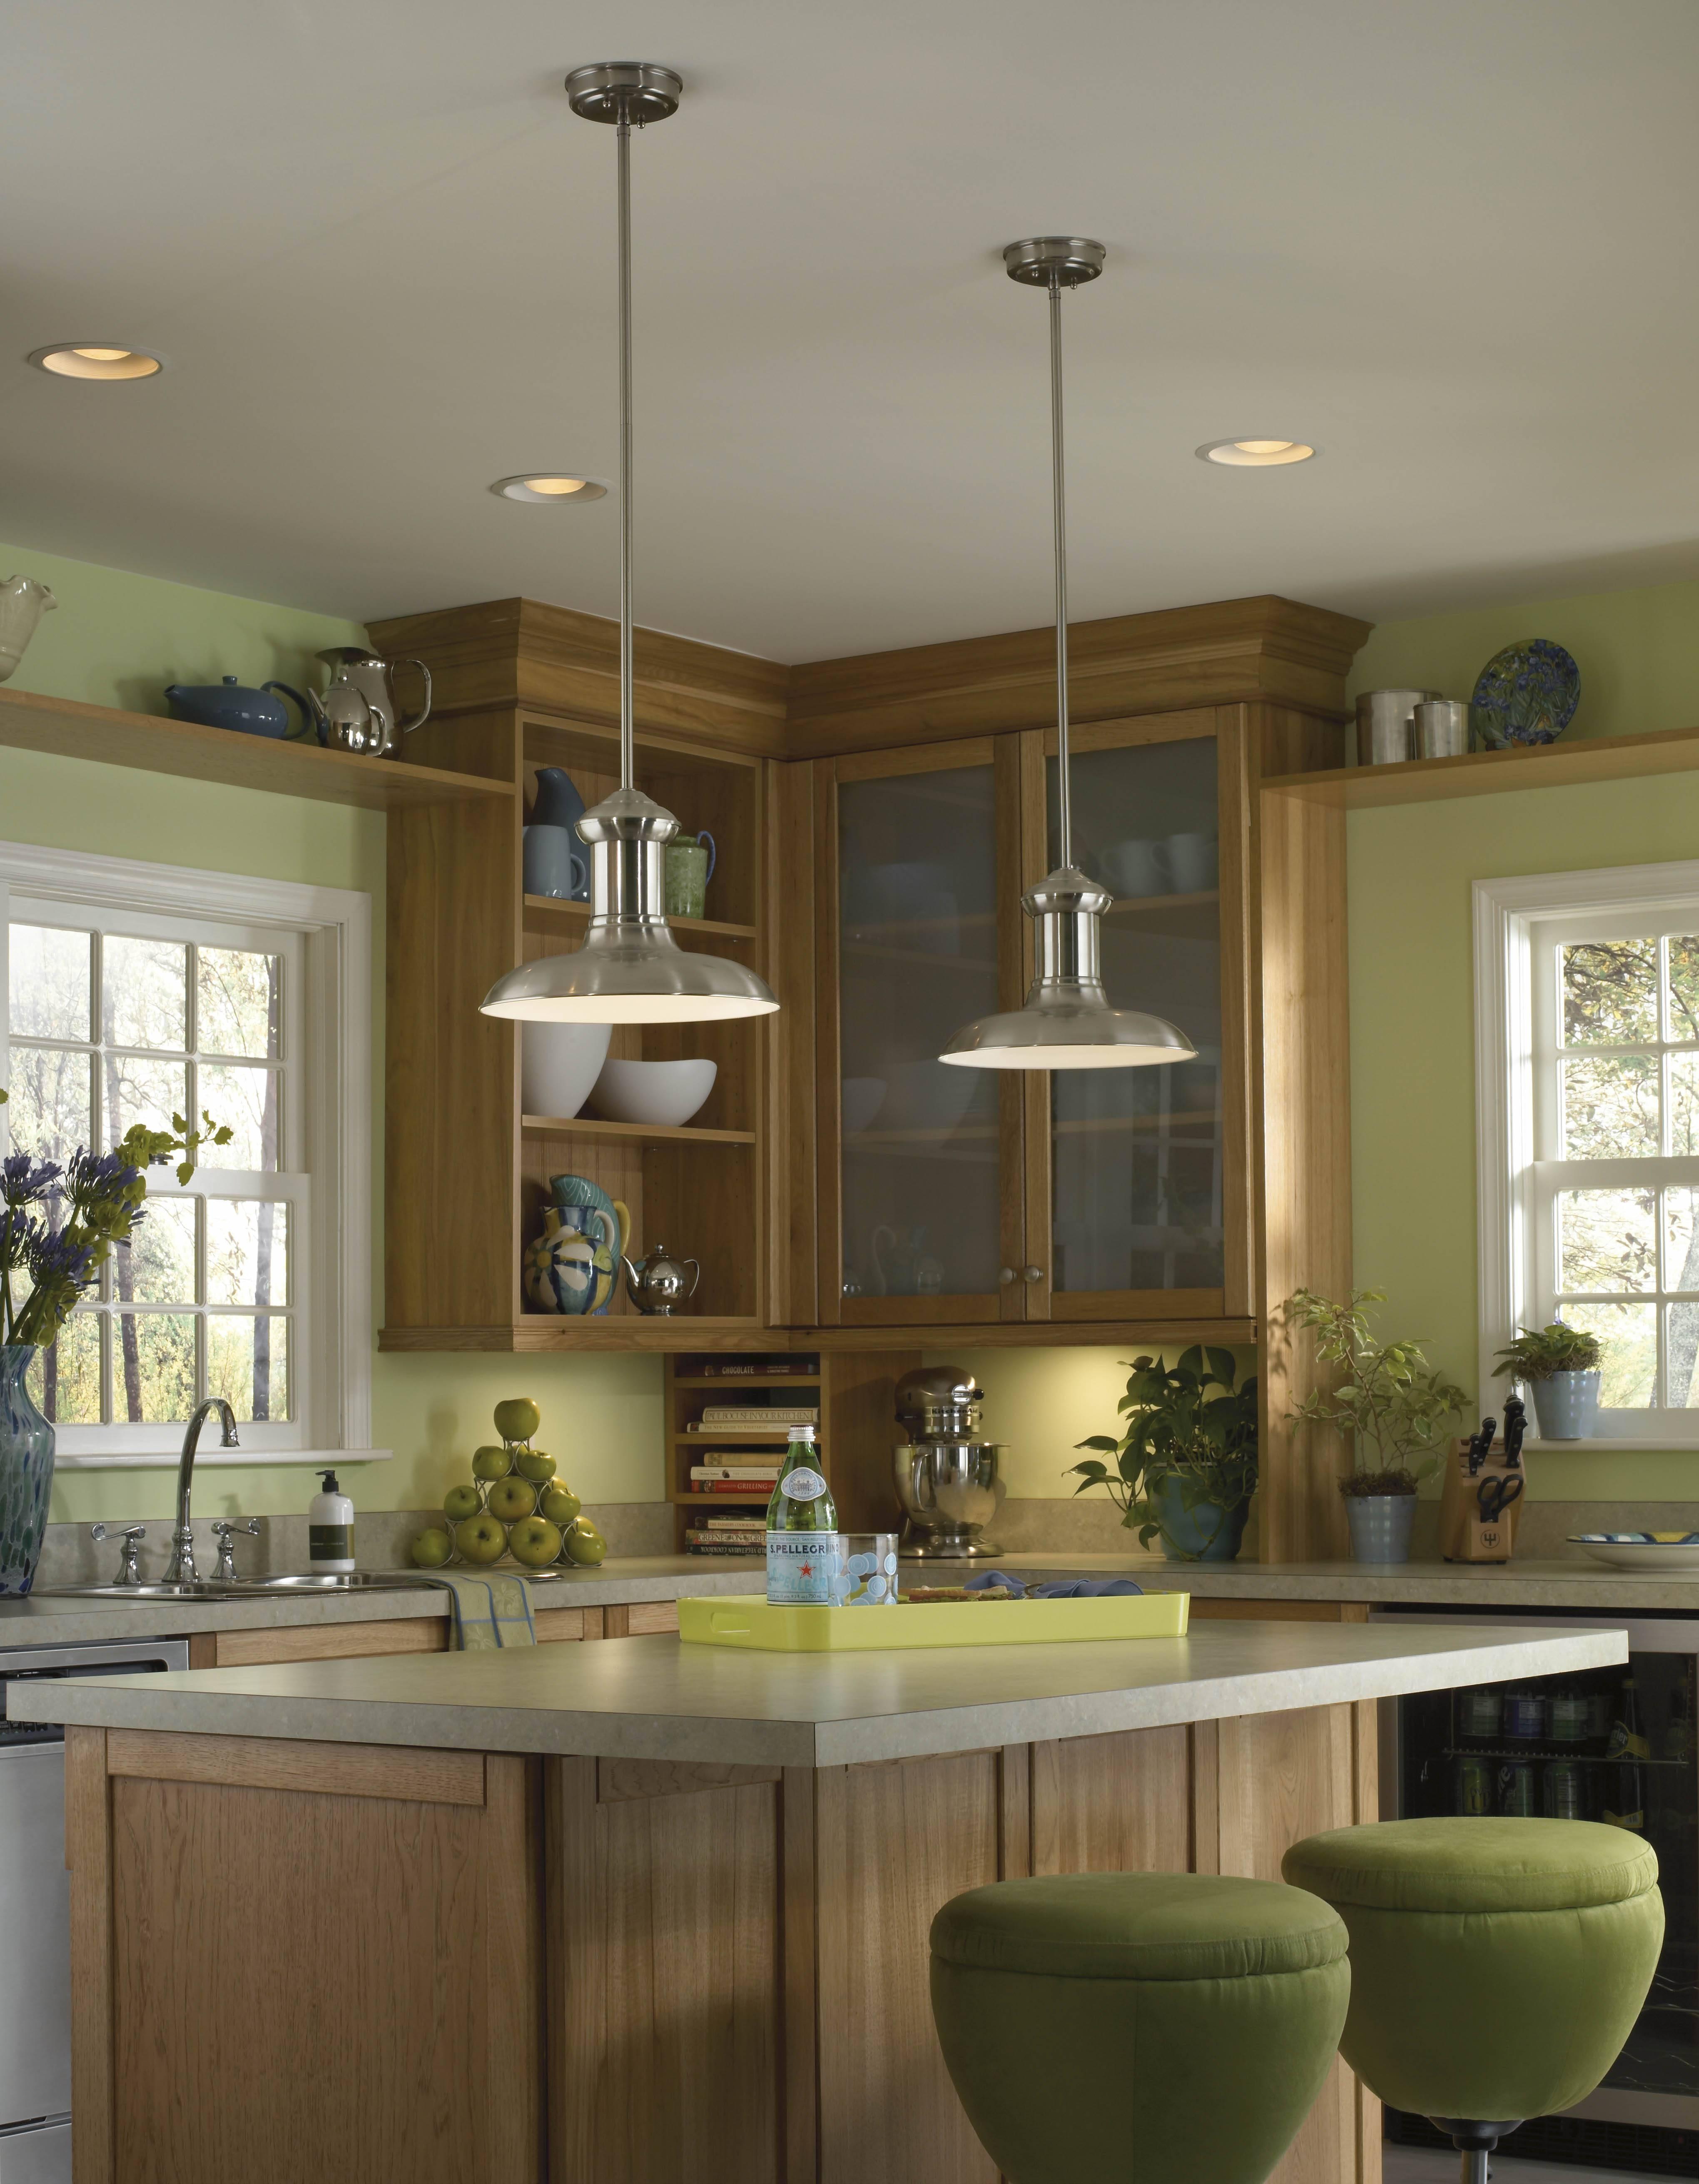 Mini Pendant Lights Over Kitchen Island – Aneilve with Mini Pendants Lights For Kitchen Island (Image 13 of 15)